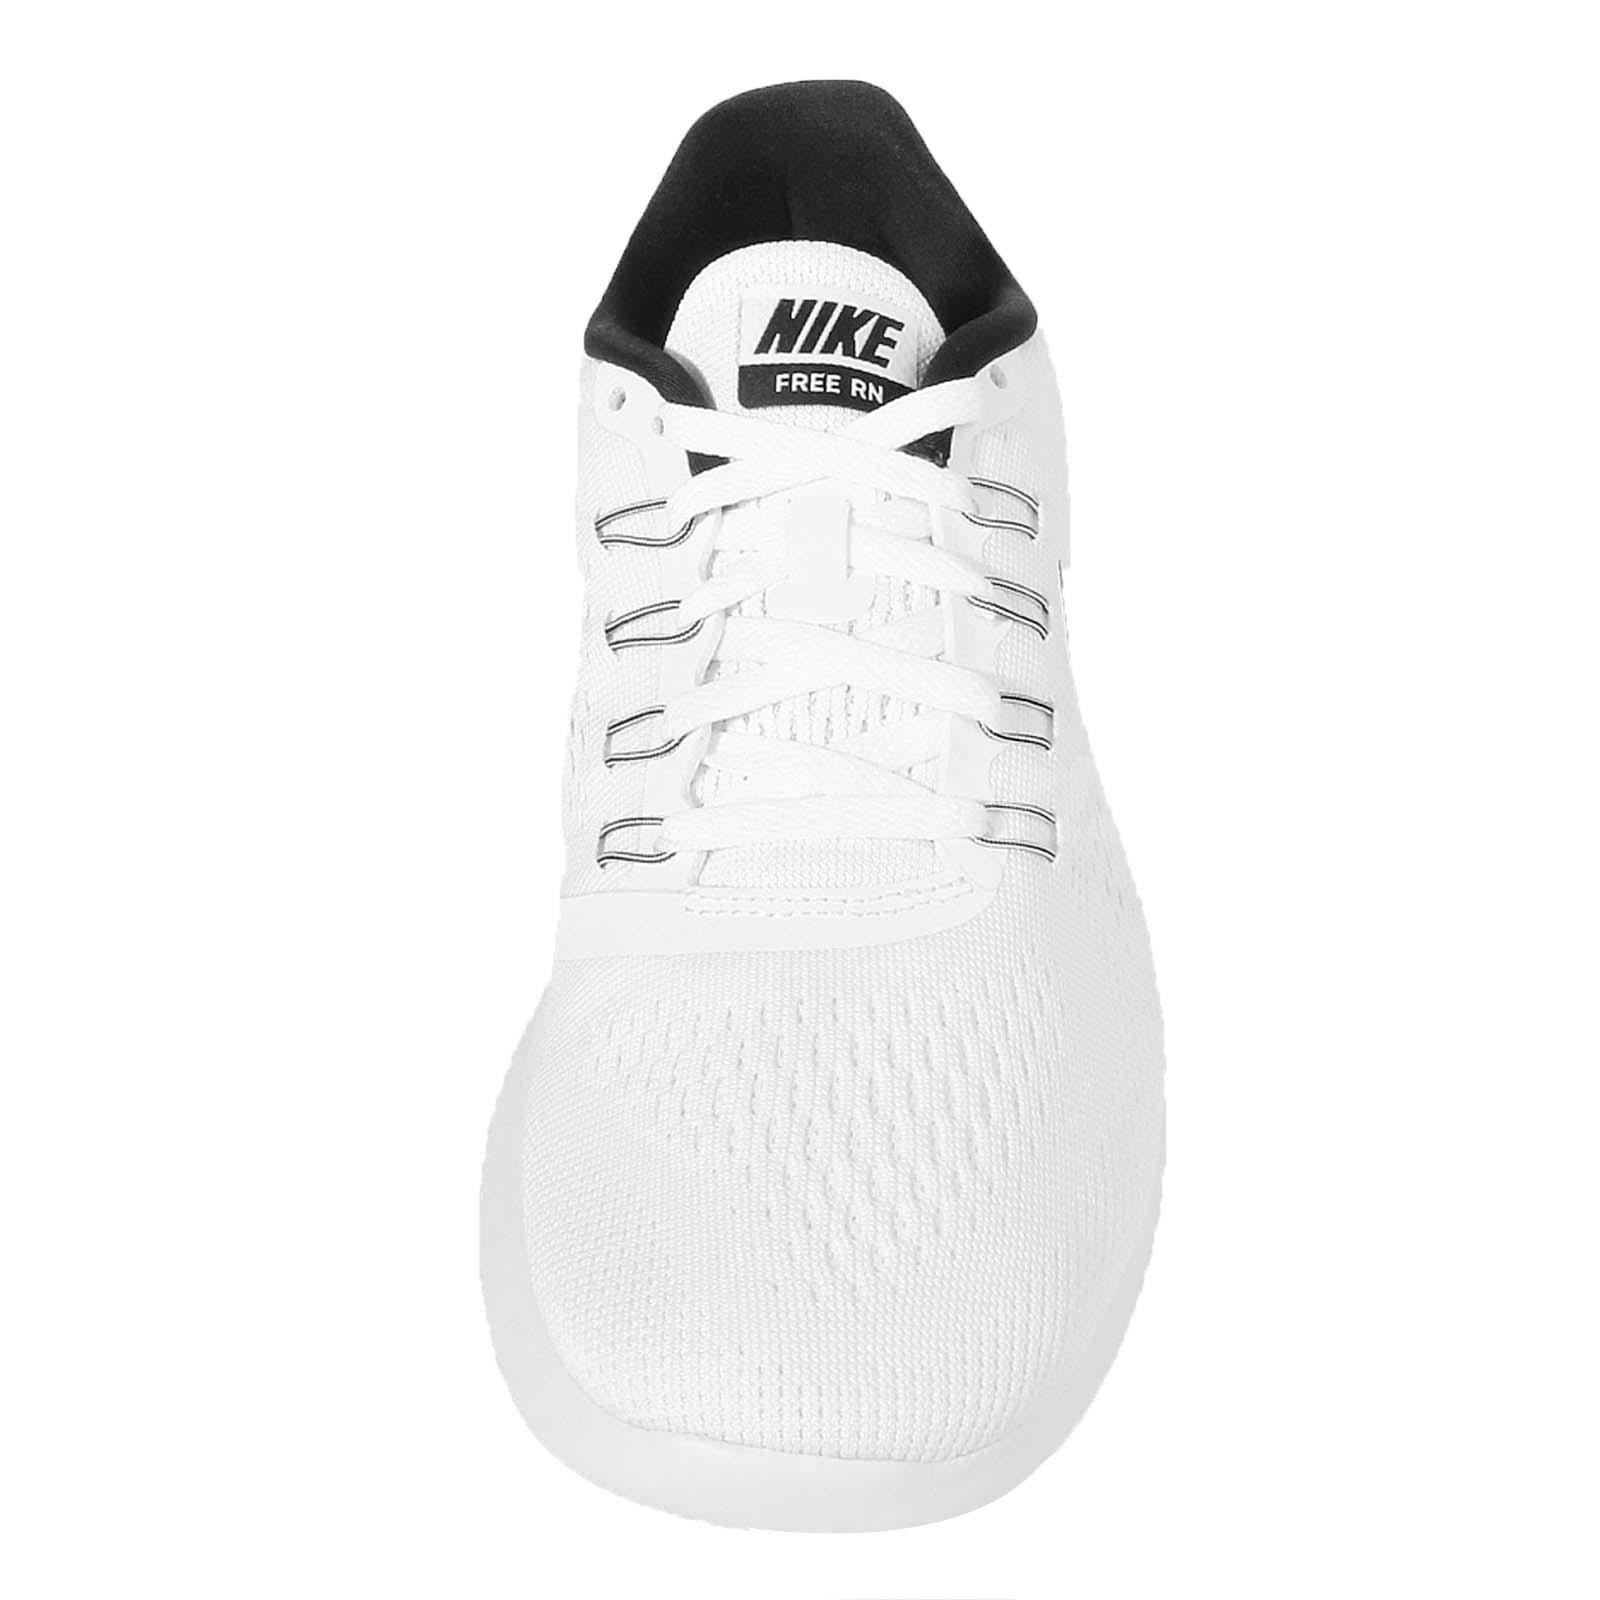 Nike Zapatillas De Correr Para Mujeres Banco Nacional De Filipinas EAn48